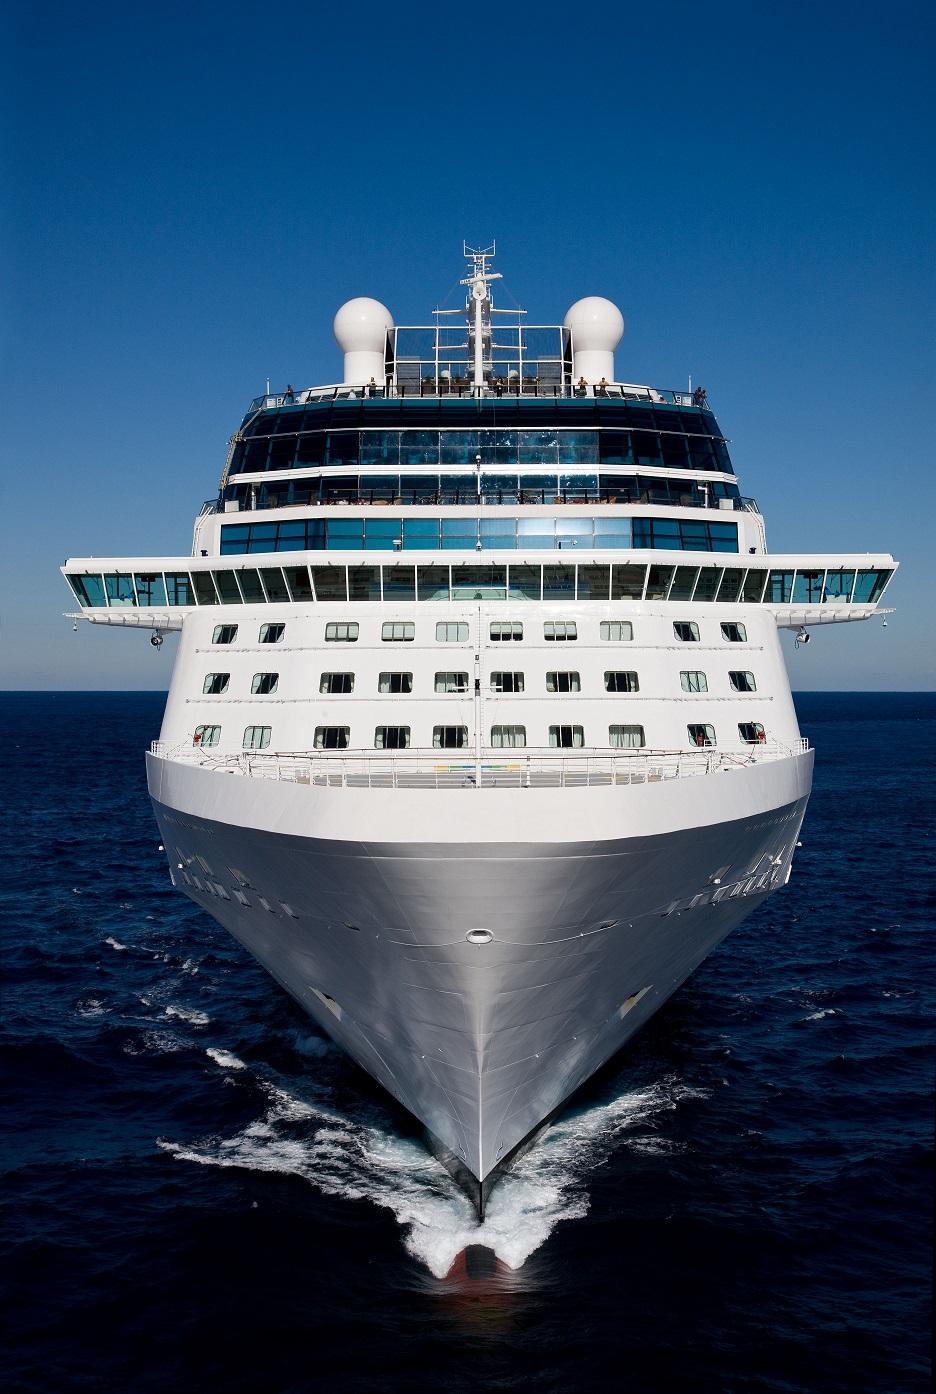 Celebrity Solstice kryssningsfartyg frontvy